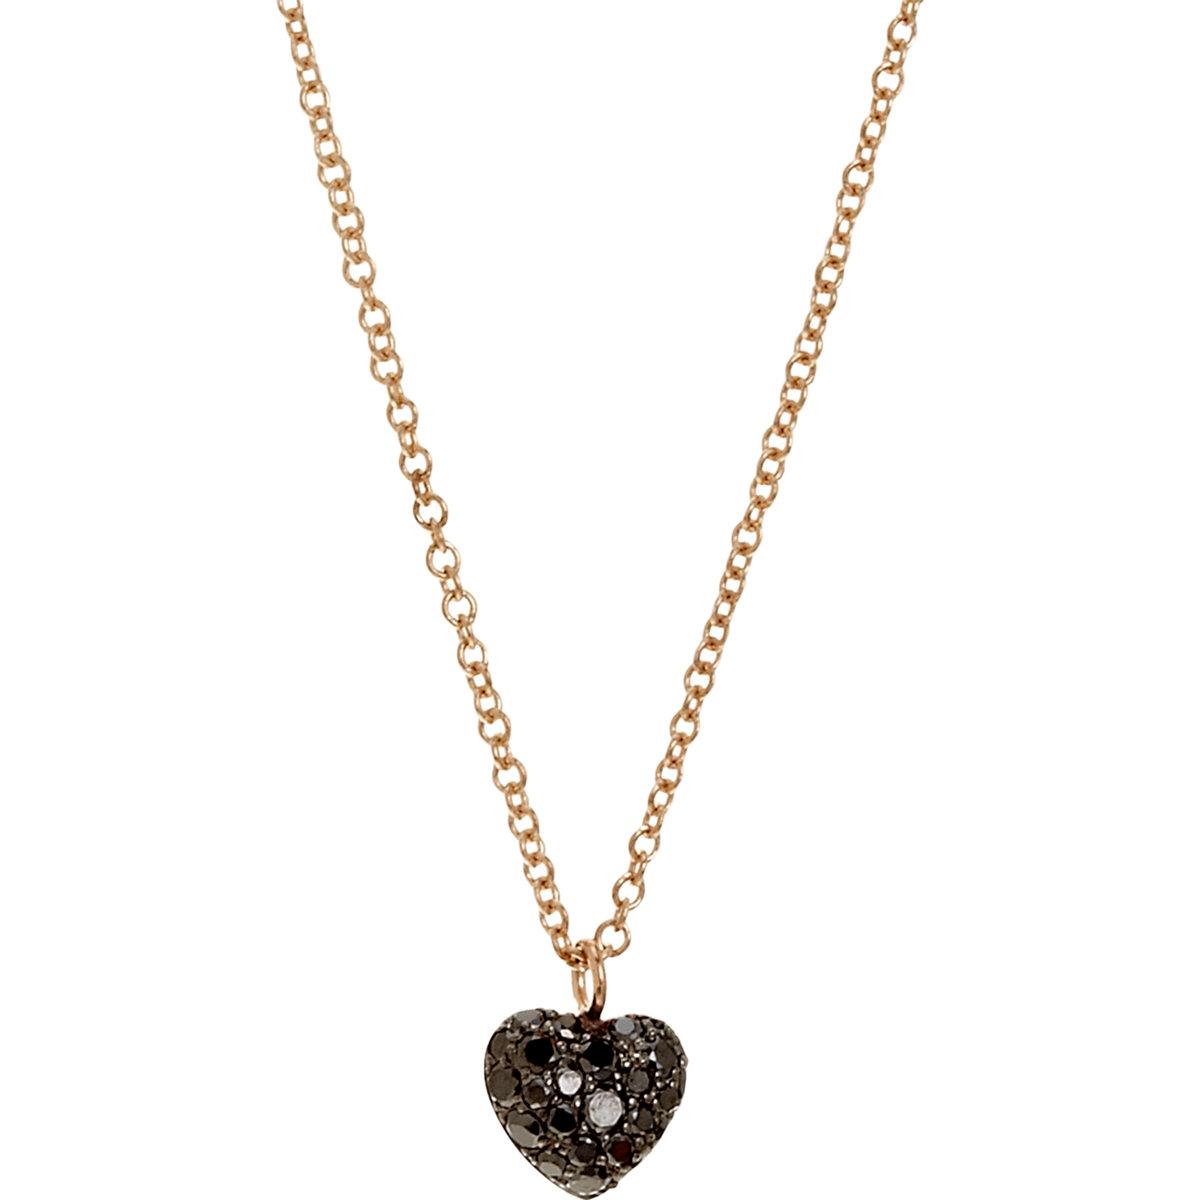 Lyst finn black diamond puffed heart pendant necklace in metallic gallery aloadofball Image collections